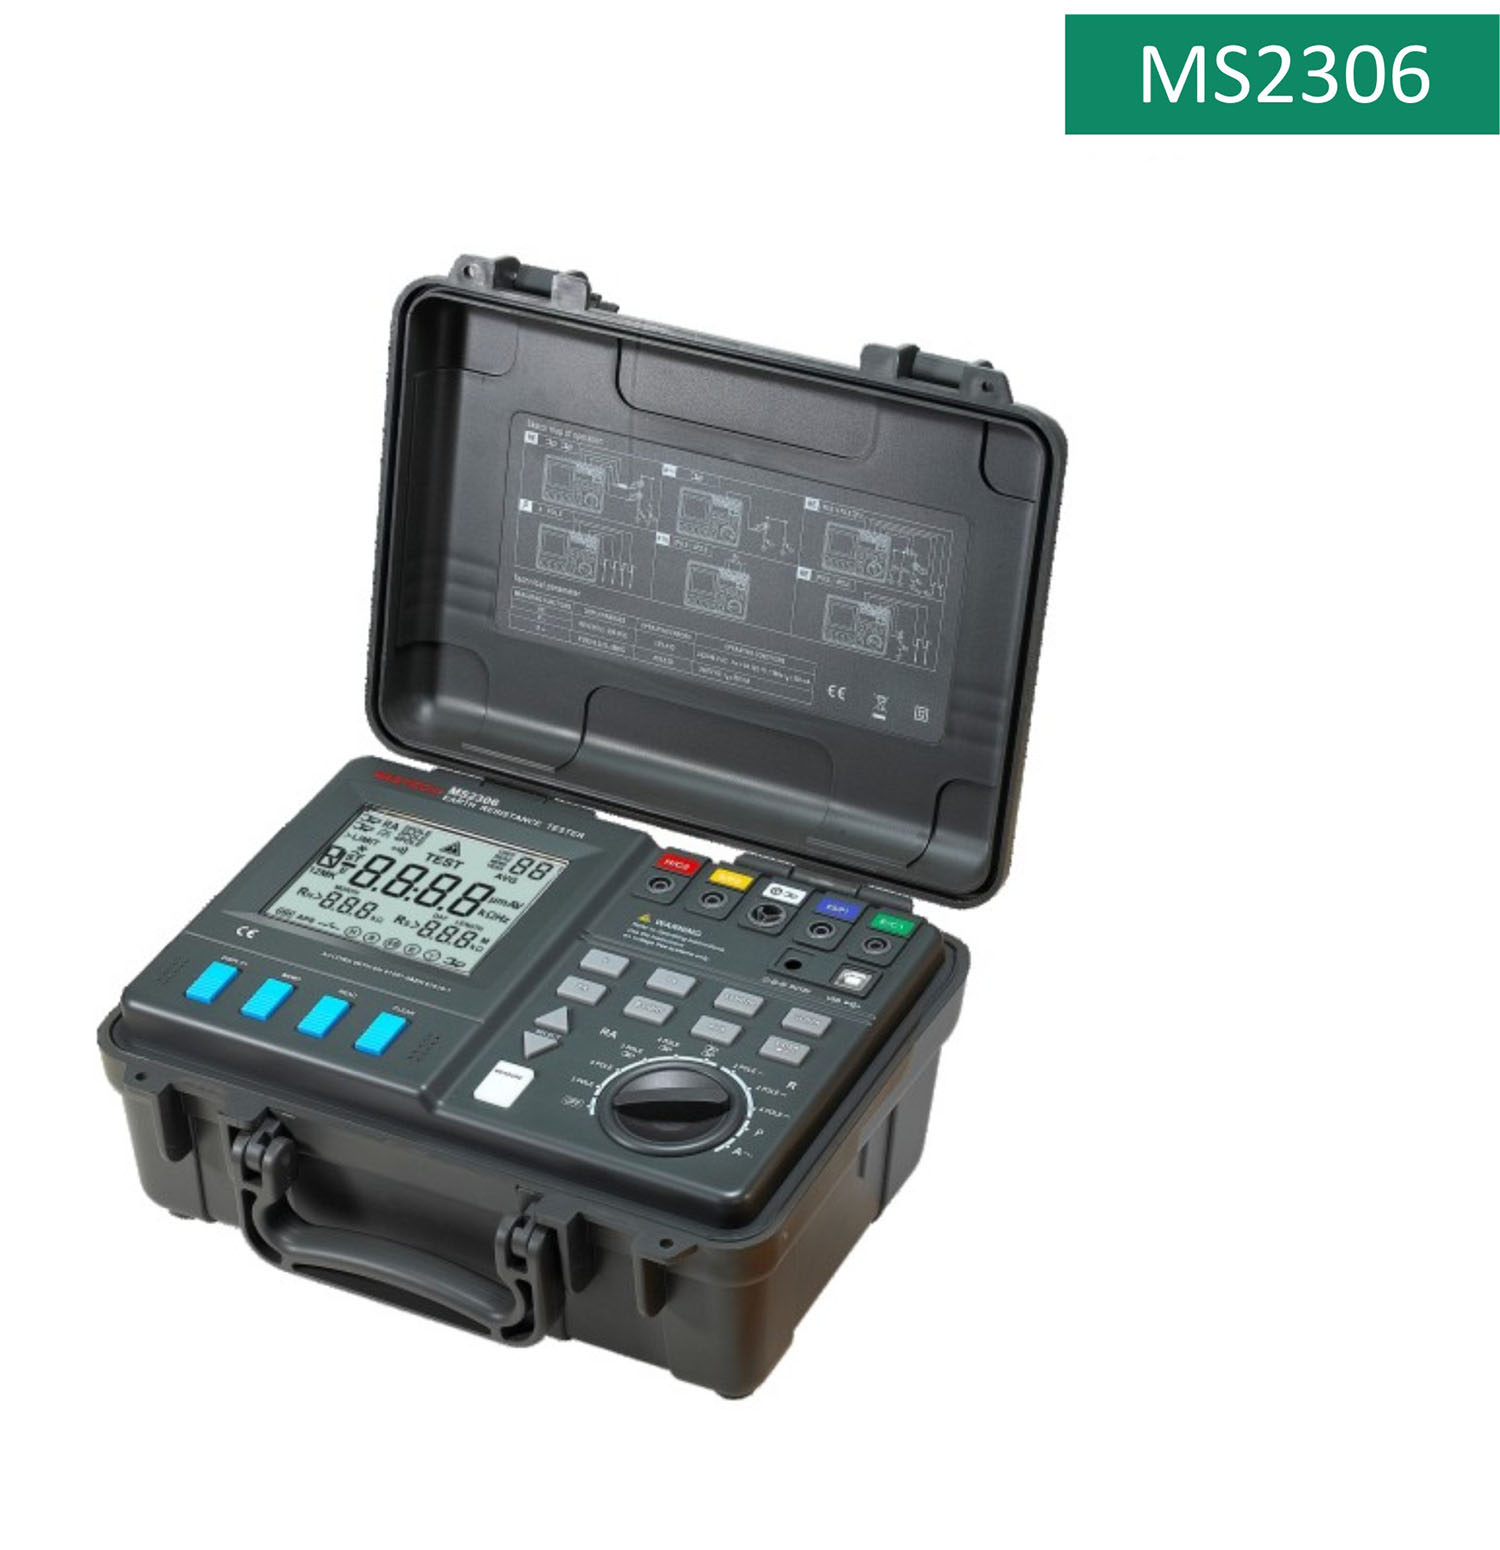 MS2306